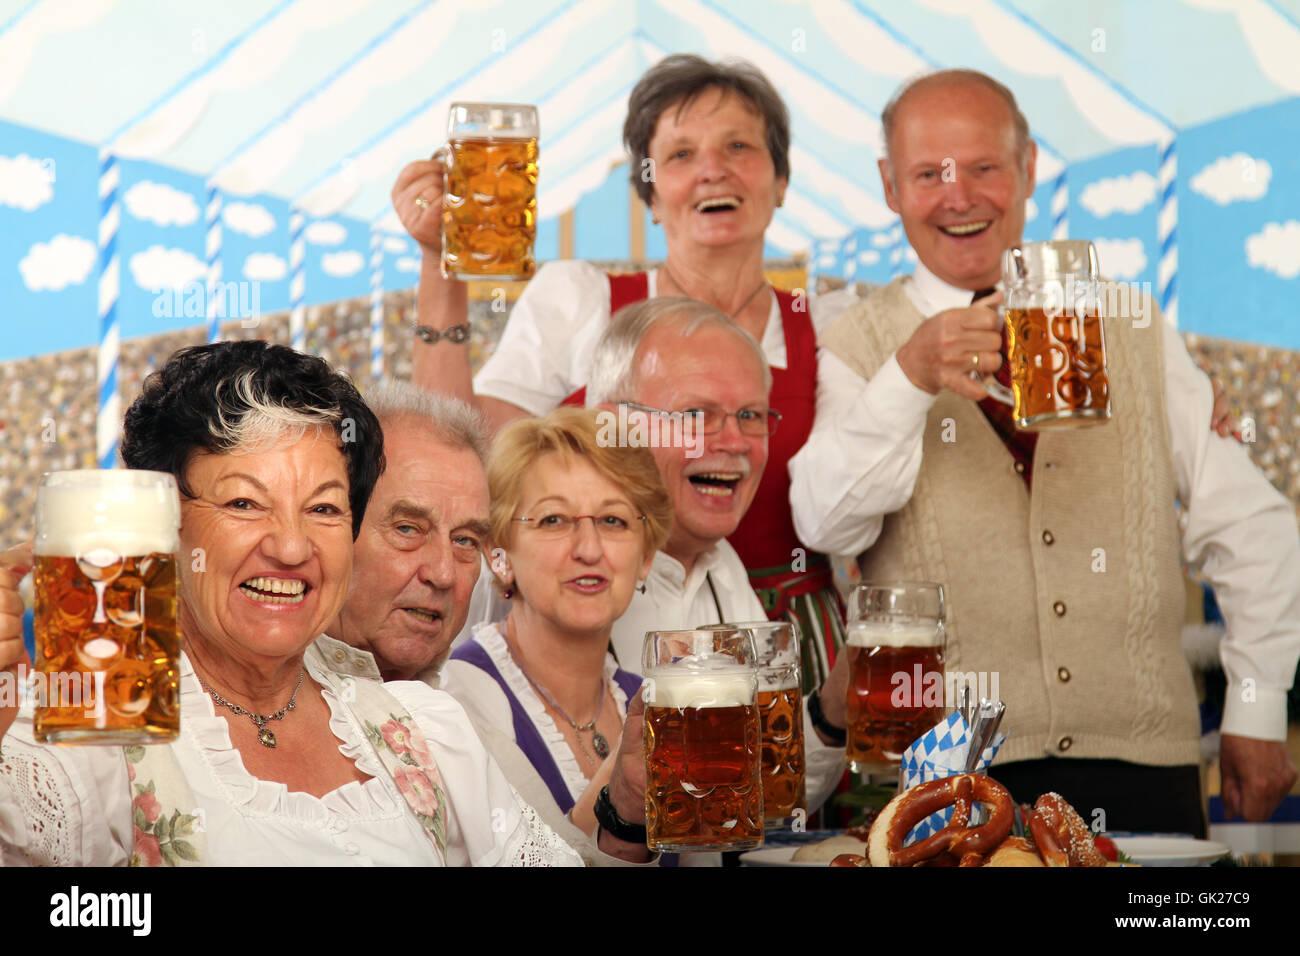 seniors at the wiesn - Stock Image